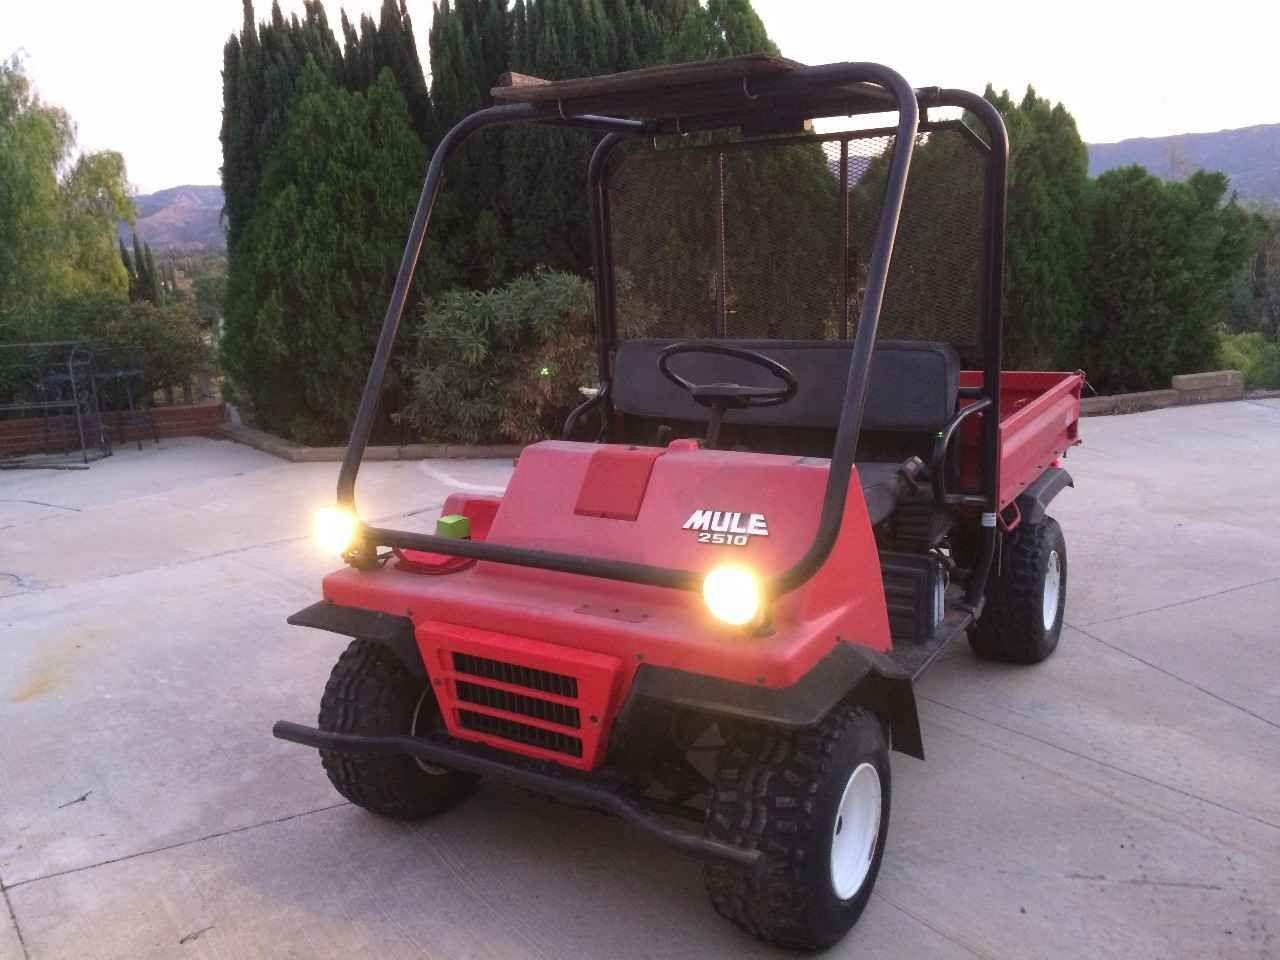 Used 1994 Kawasaki MULE 2510 ATVs For Sale in California.   Kawasaki